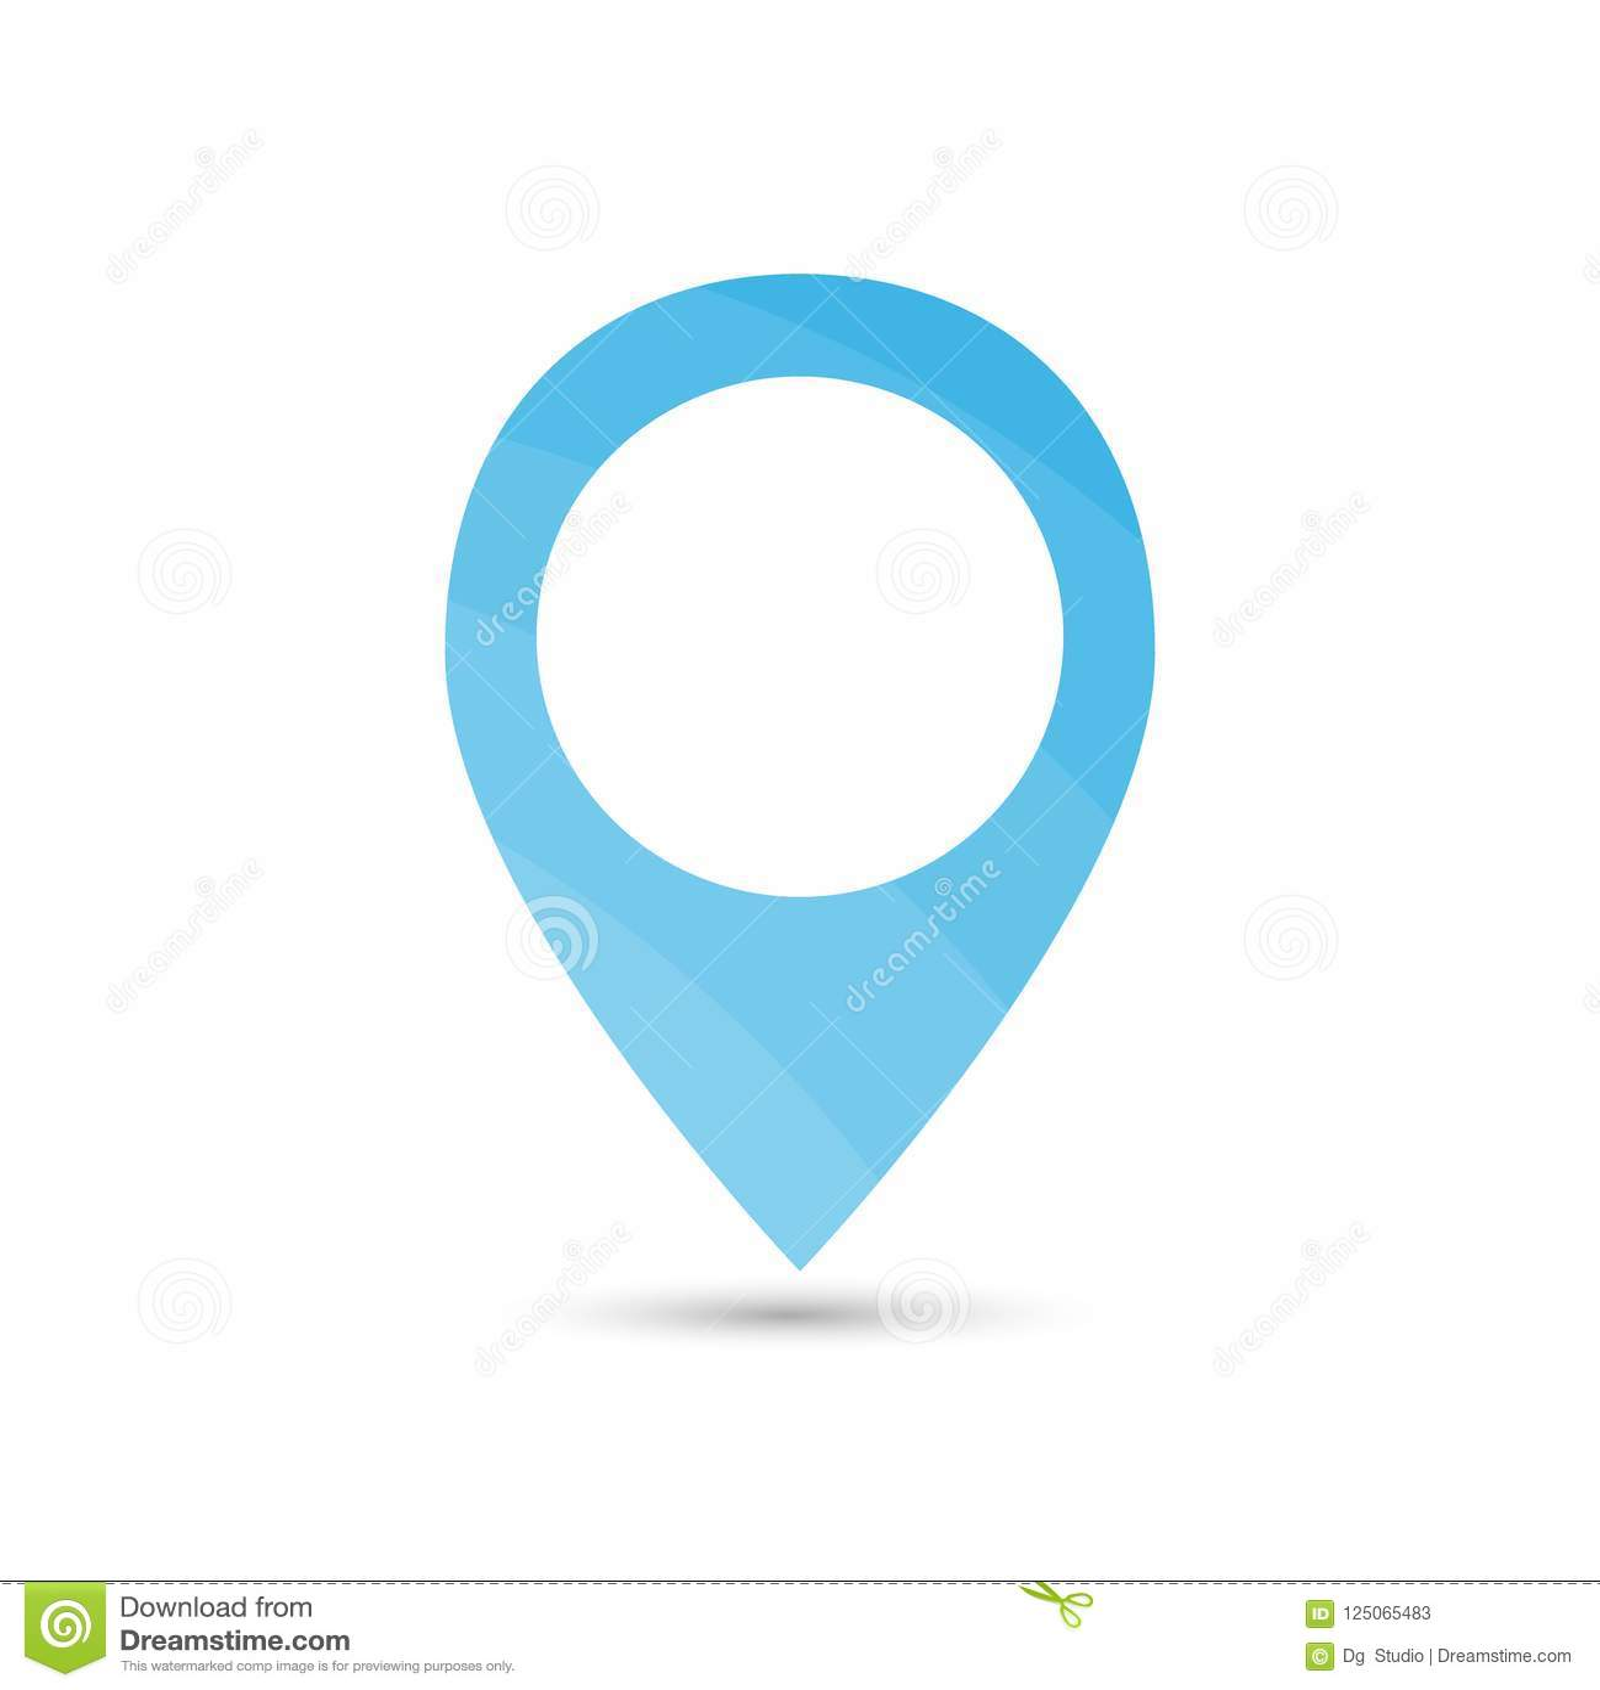 Map Symbol, Map Pointer, Vector Icon Stock Vector ... on mod symbols, power symbols, crane symbols, sport symbols, baltimore symbols, cd symbols, race symbols, state symbols, real symbols, cook symbols,